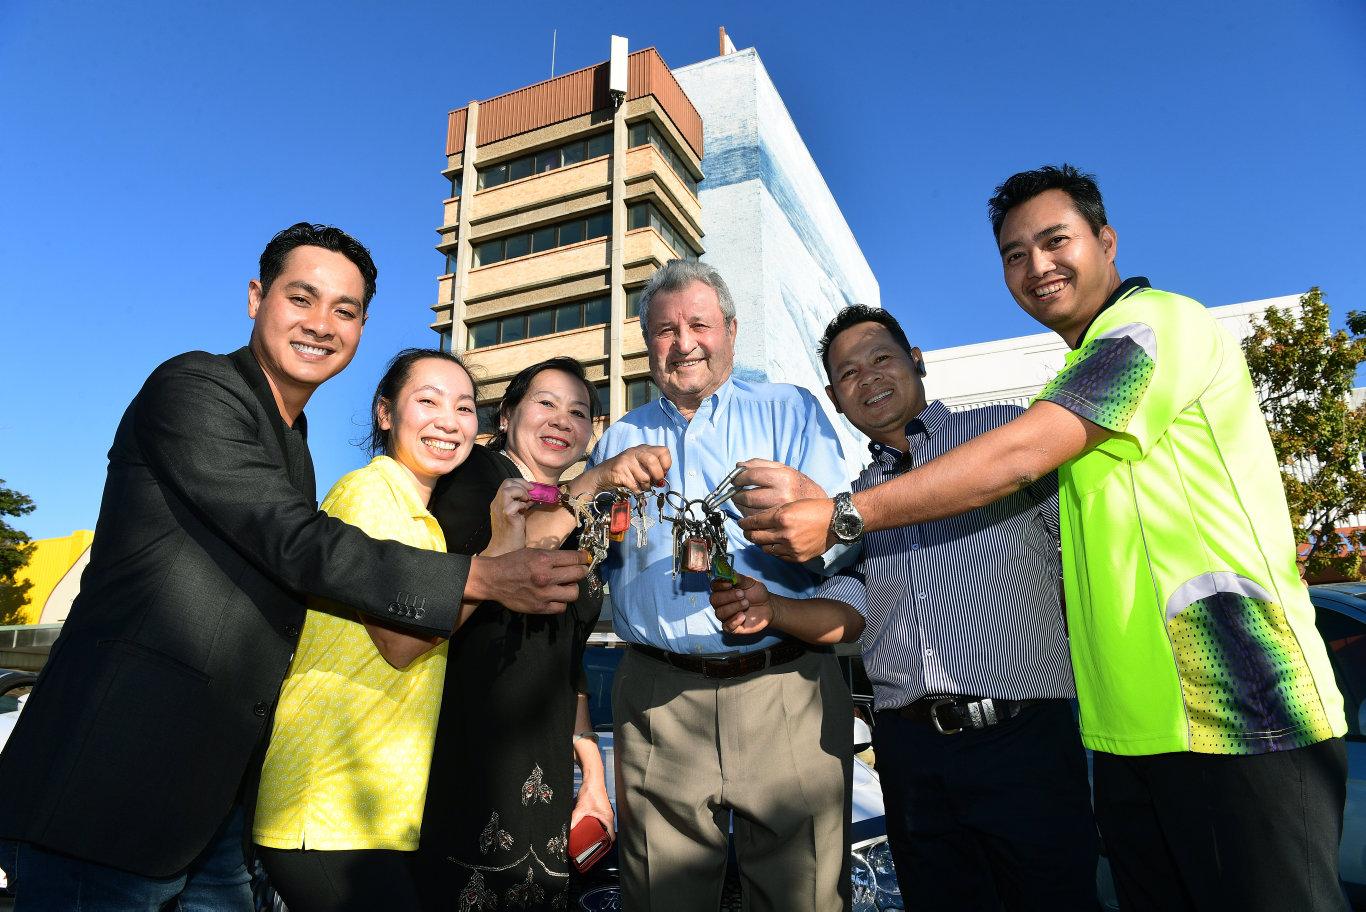 NEW OWNERS: Tam Dang, Gina Dang, Gem Nguyen, John Santalucia, Victor Dang and Toan Nguyen.